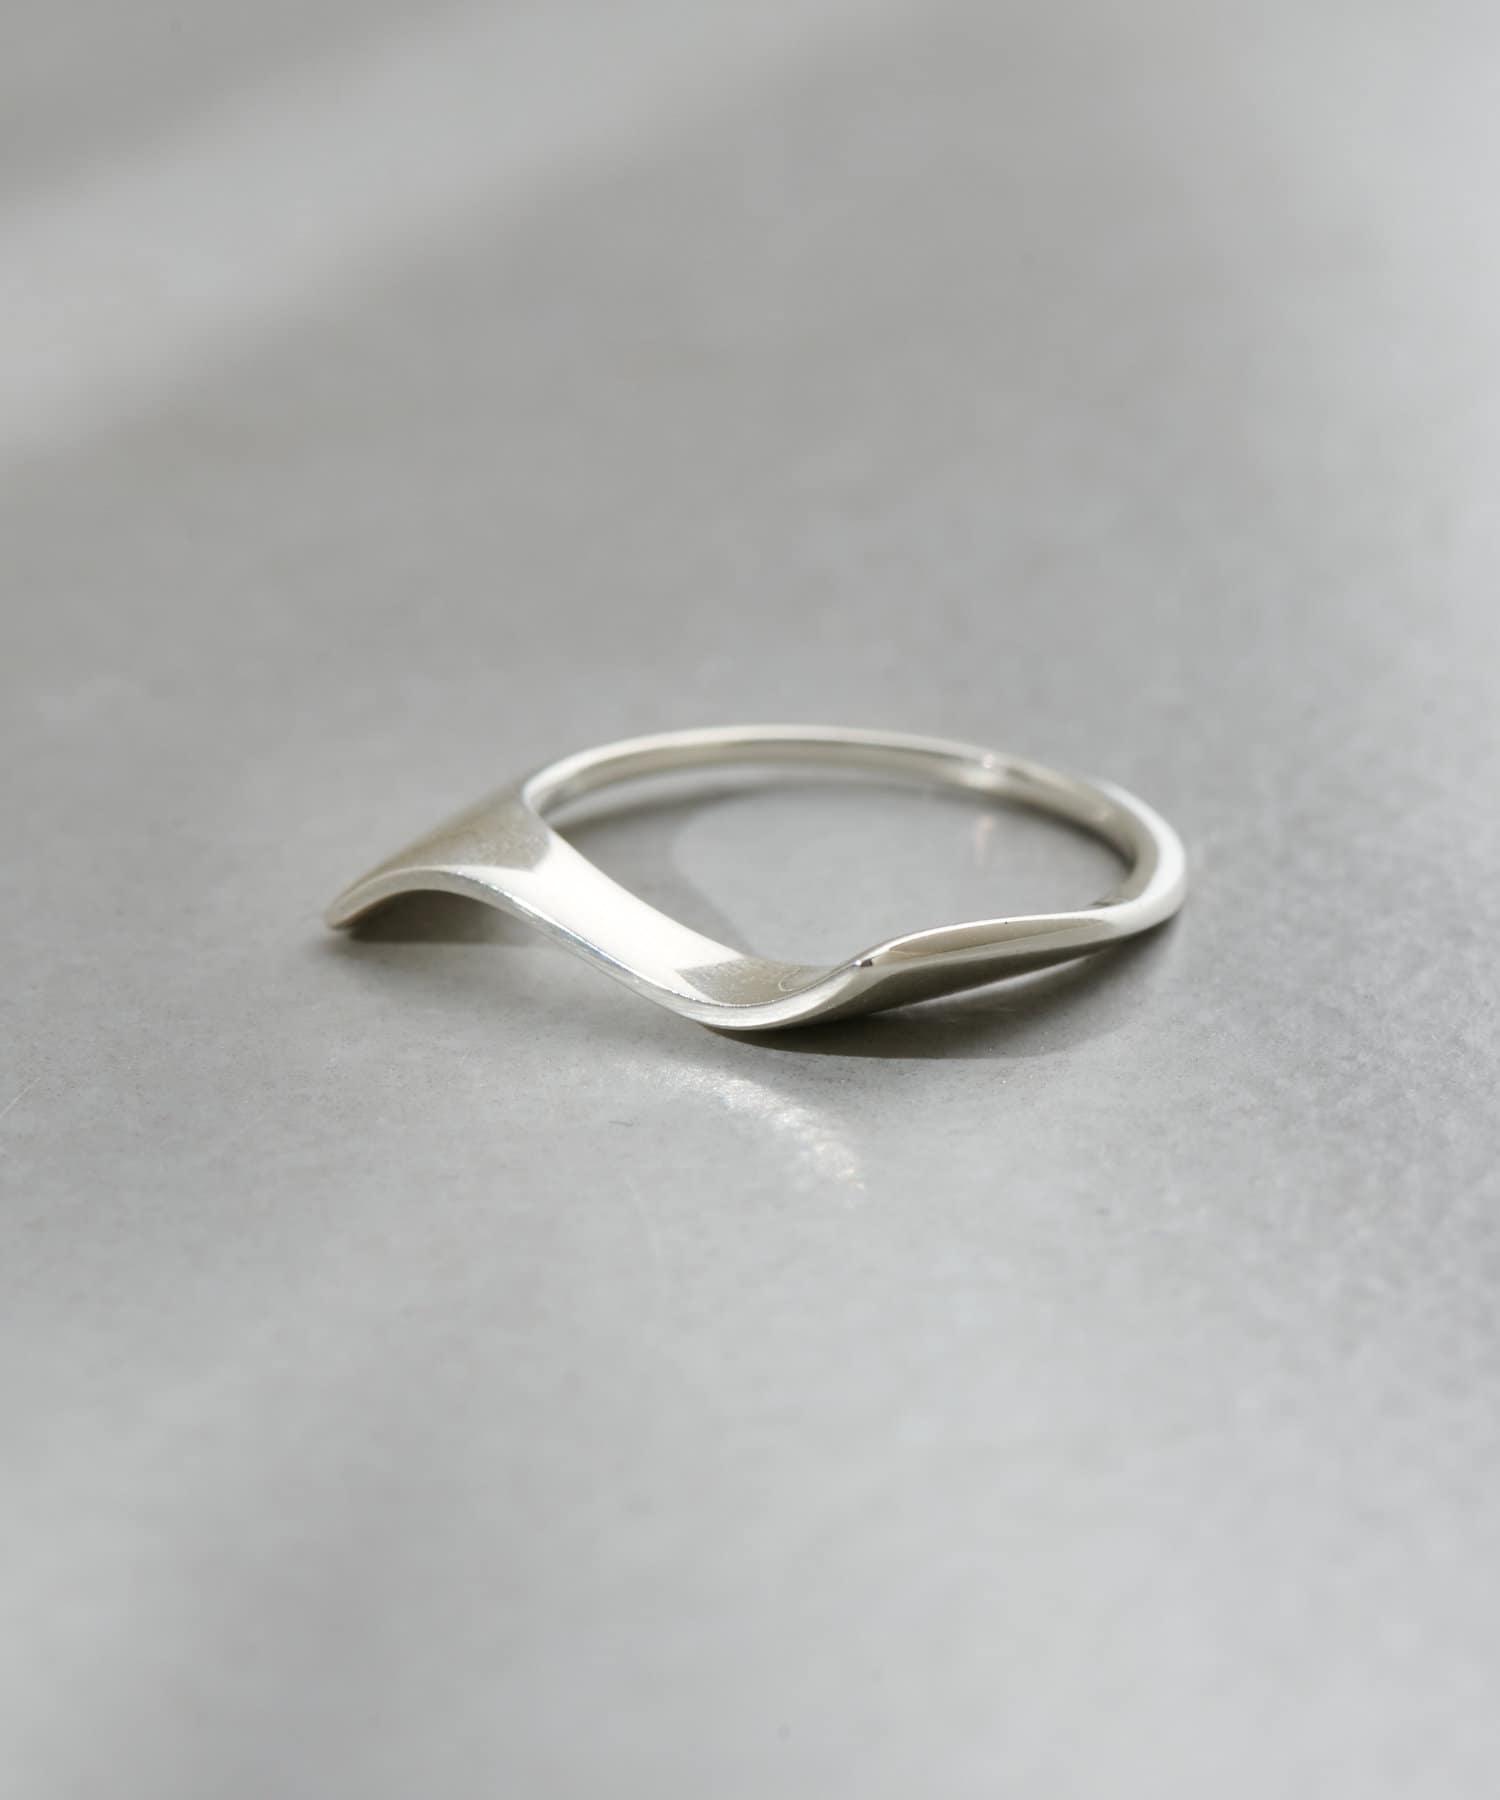 Discoat(ディスコート) AZ nuance ring